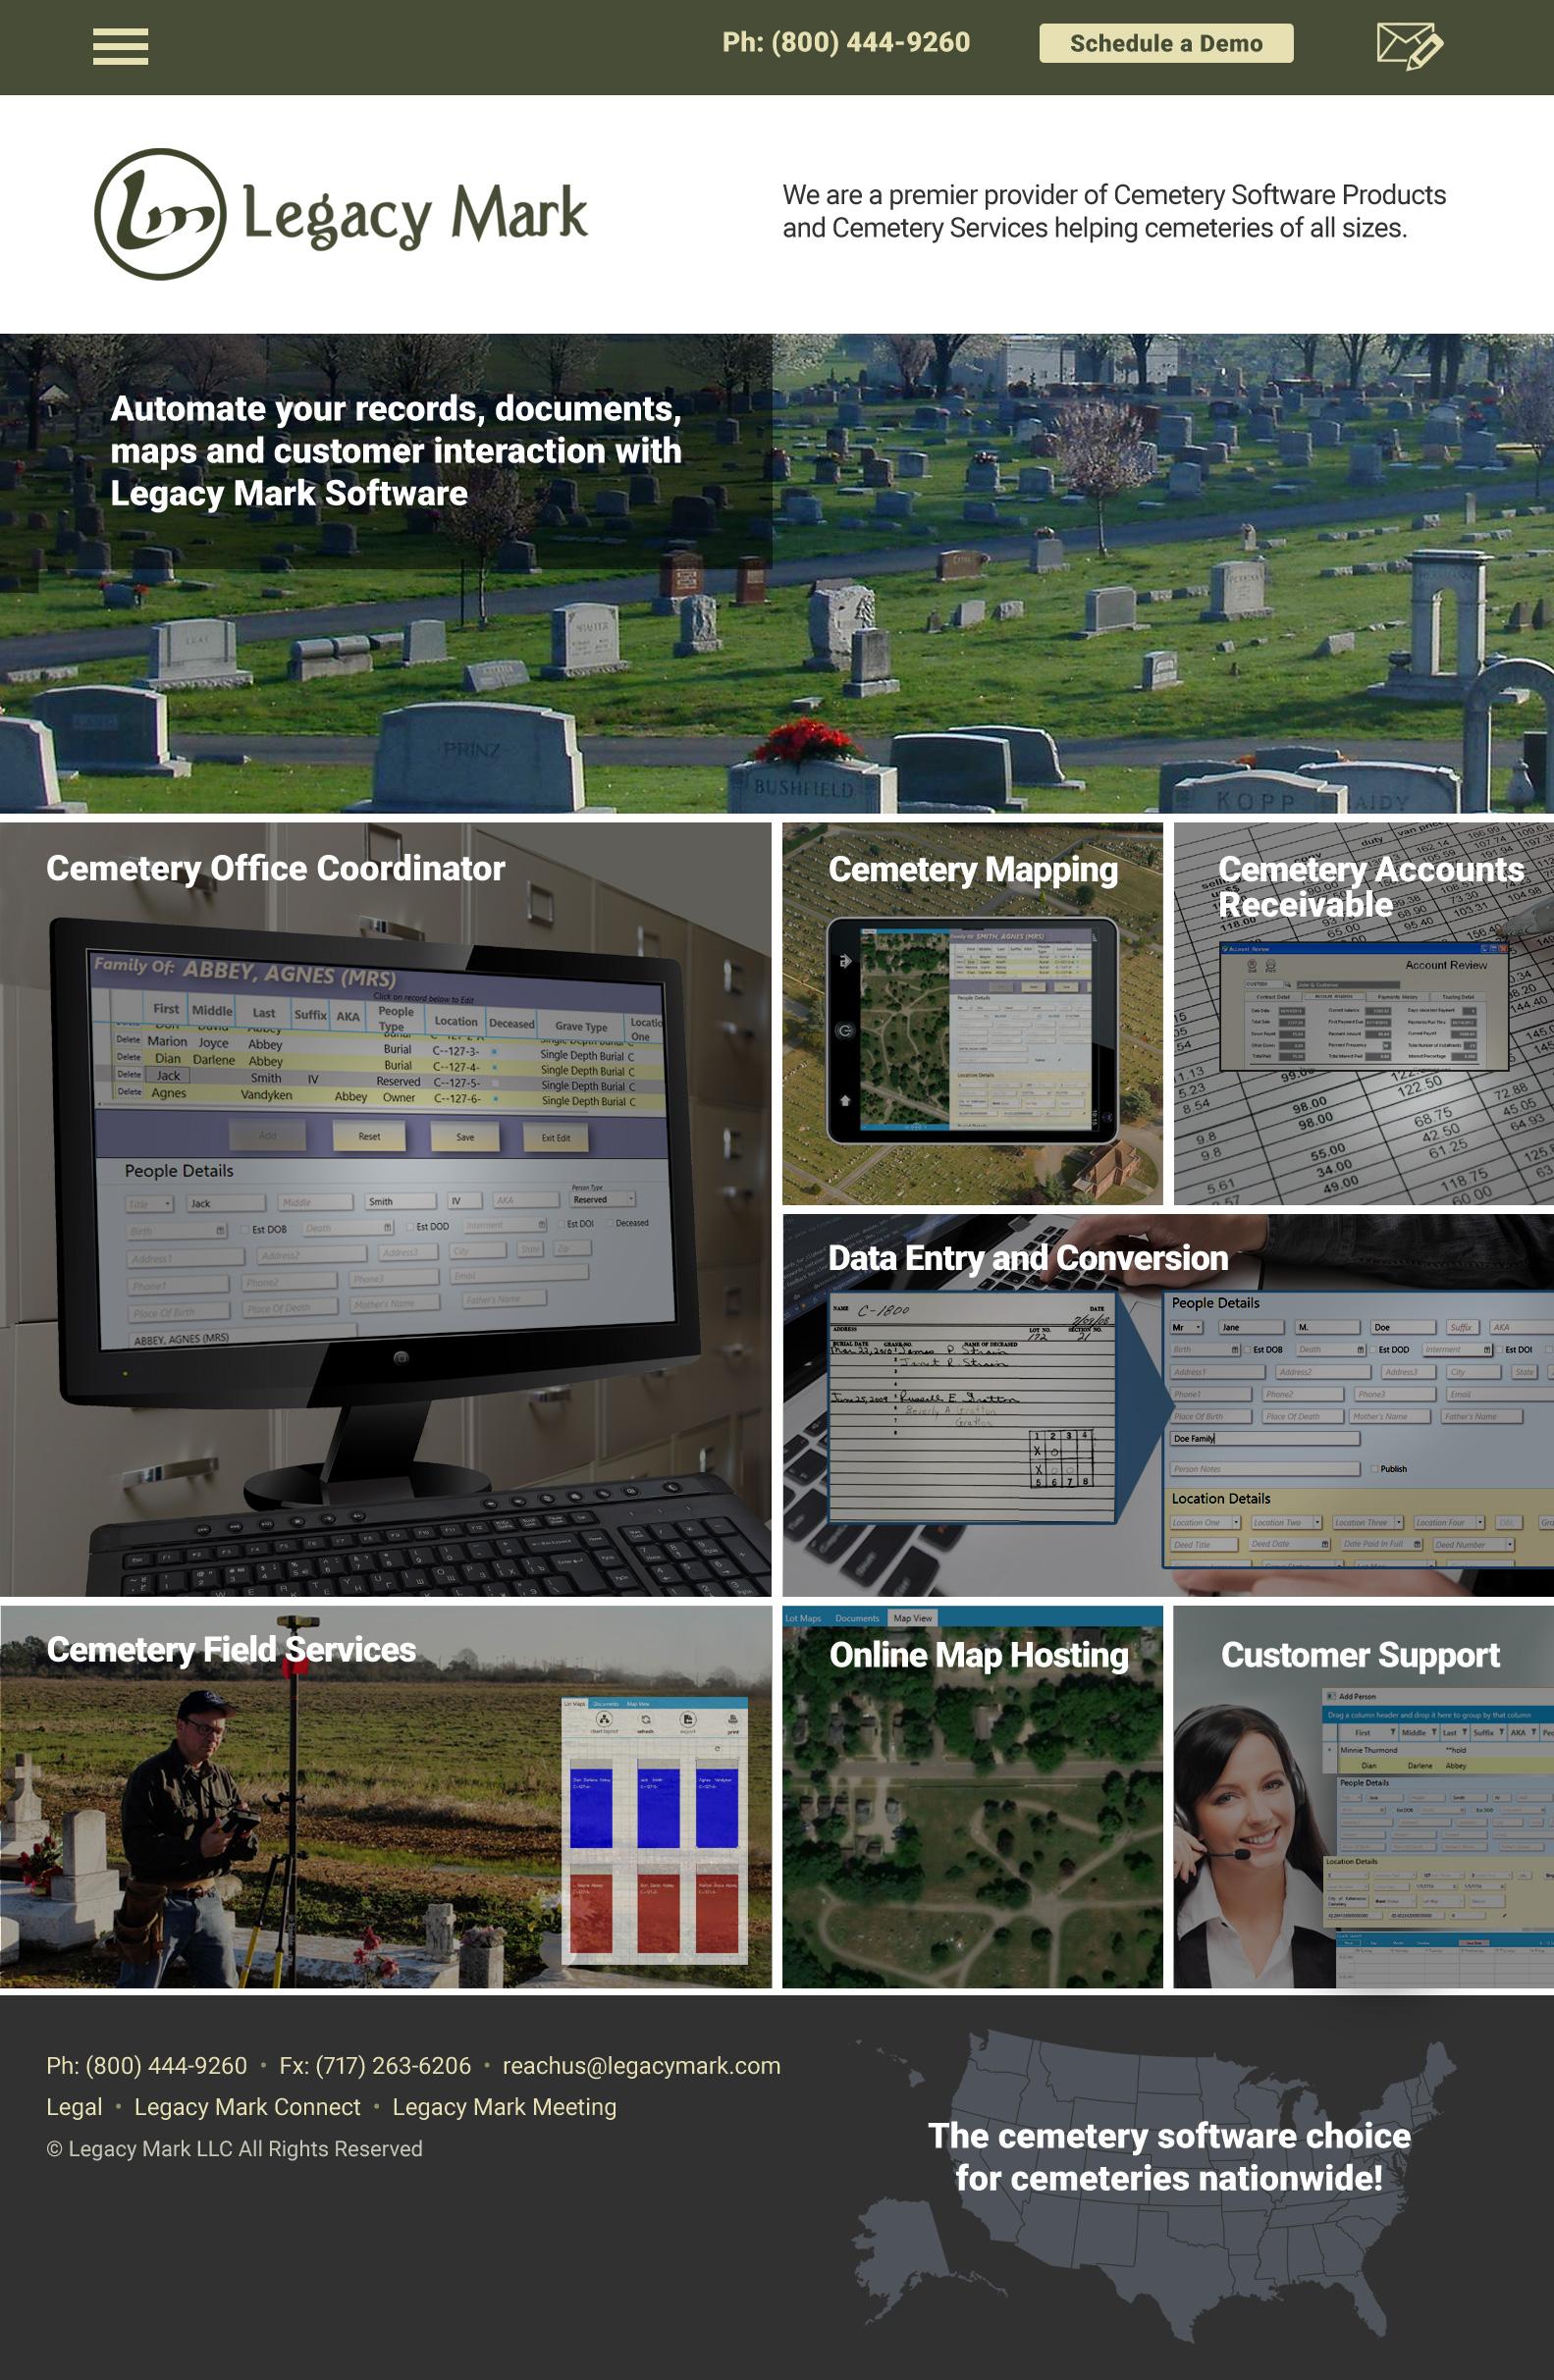 Web Design for Cemetery Software Business - Web Design